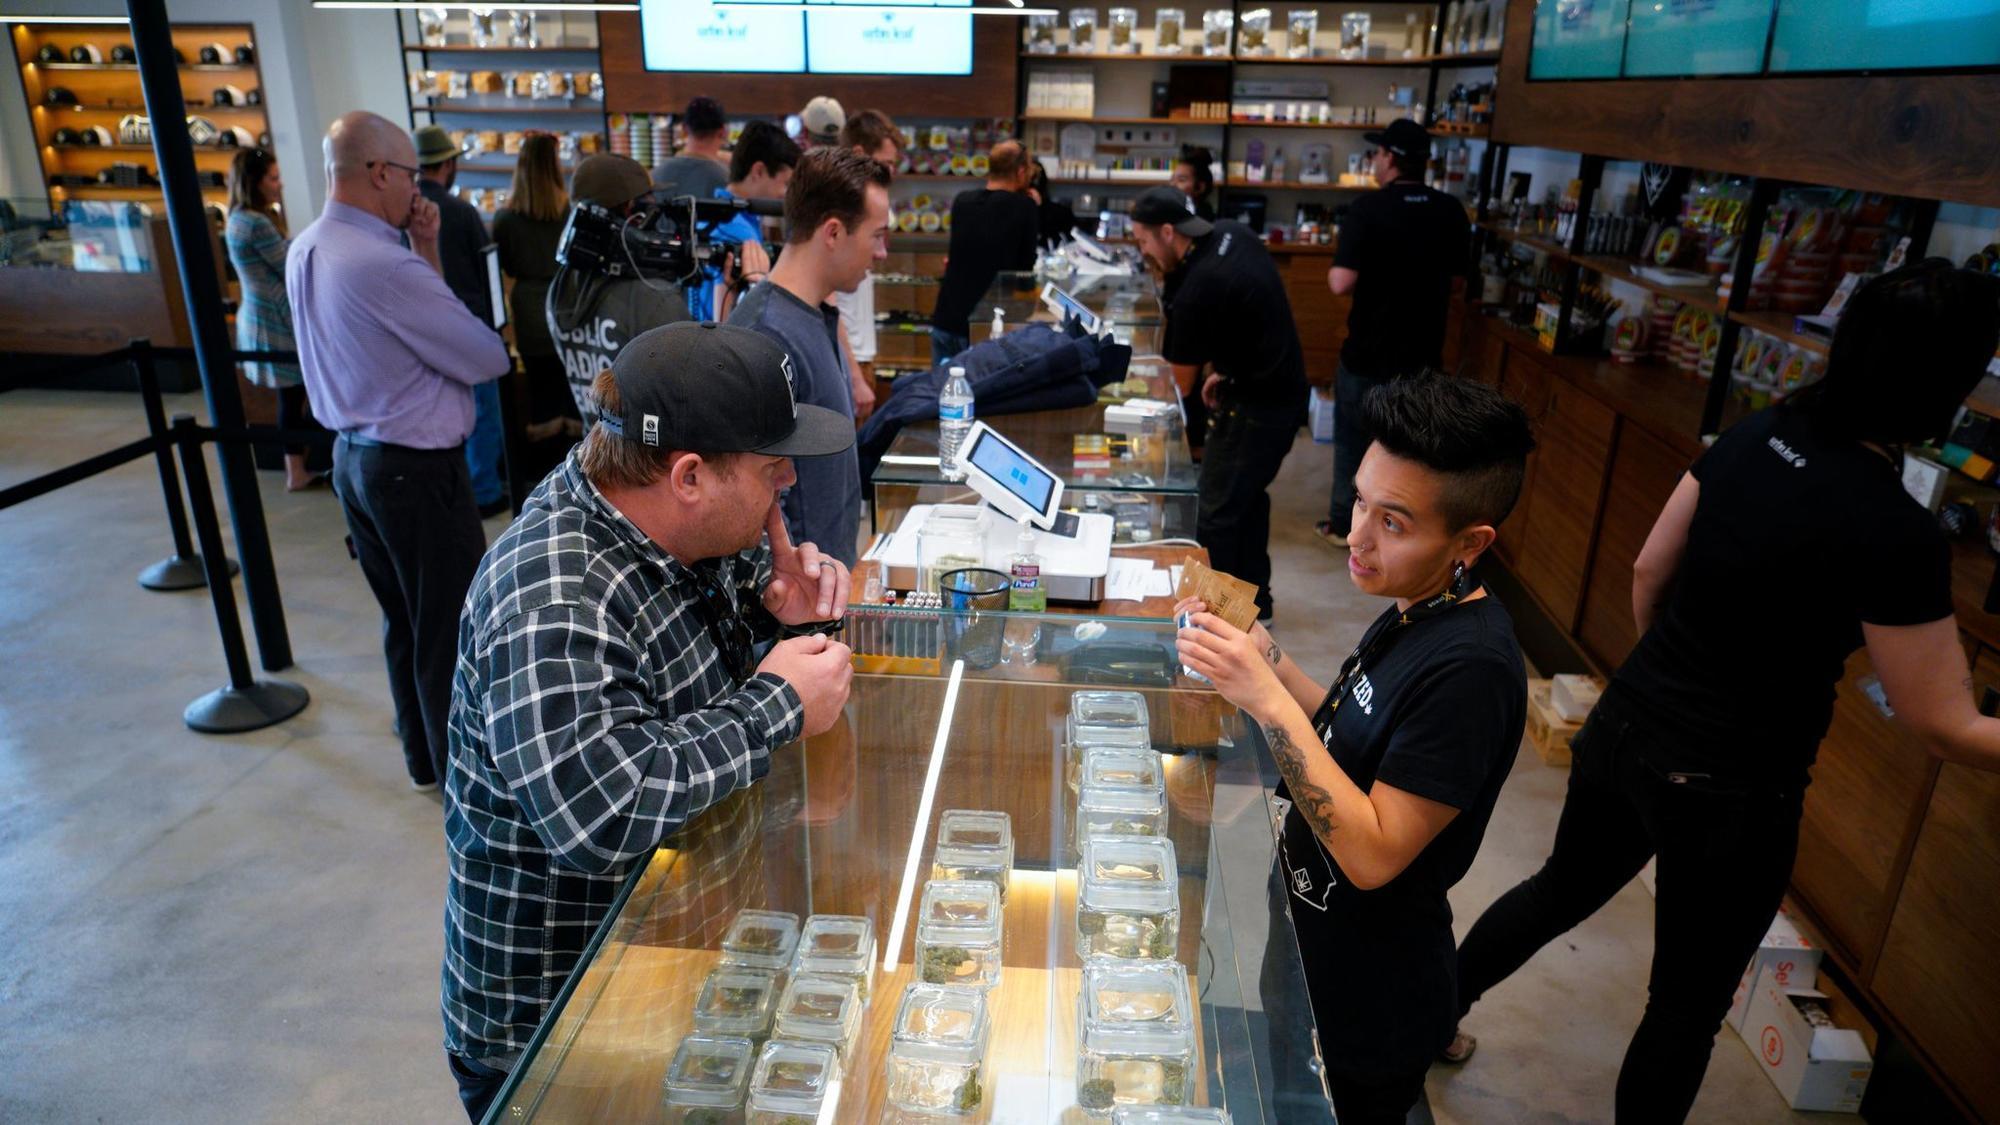 First day of recreational marijuana sales in San Diego